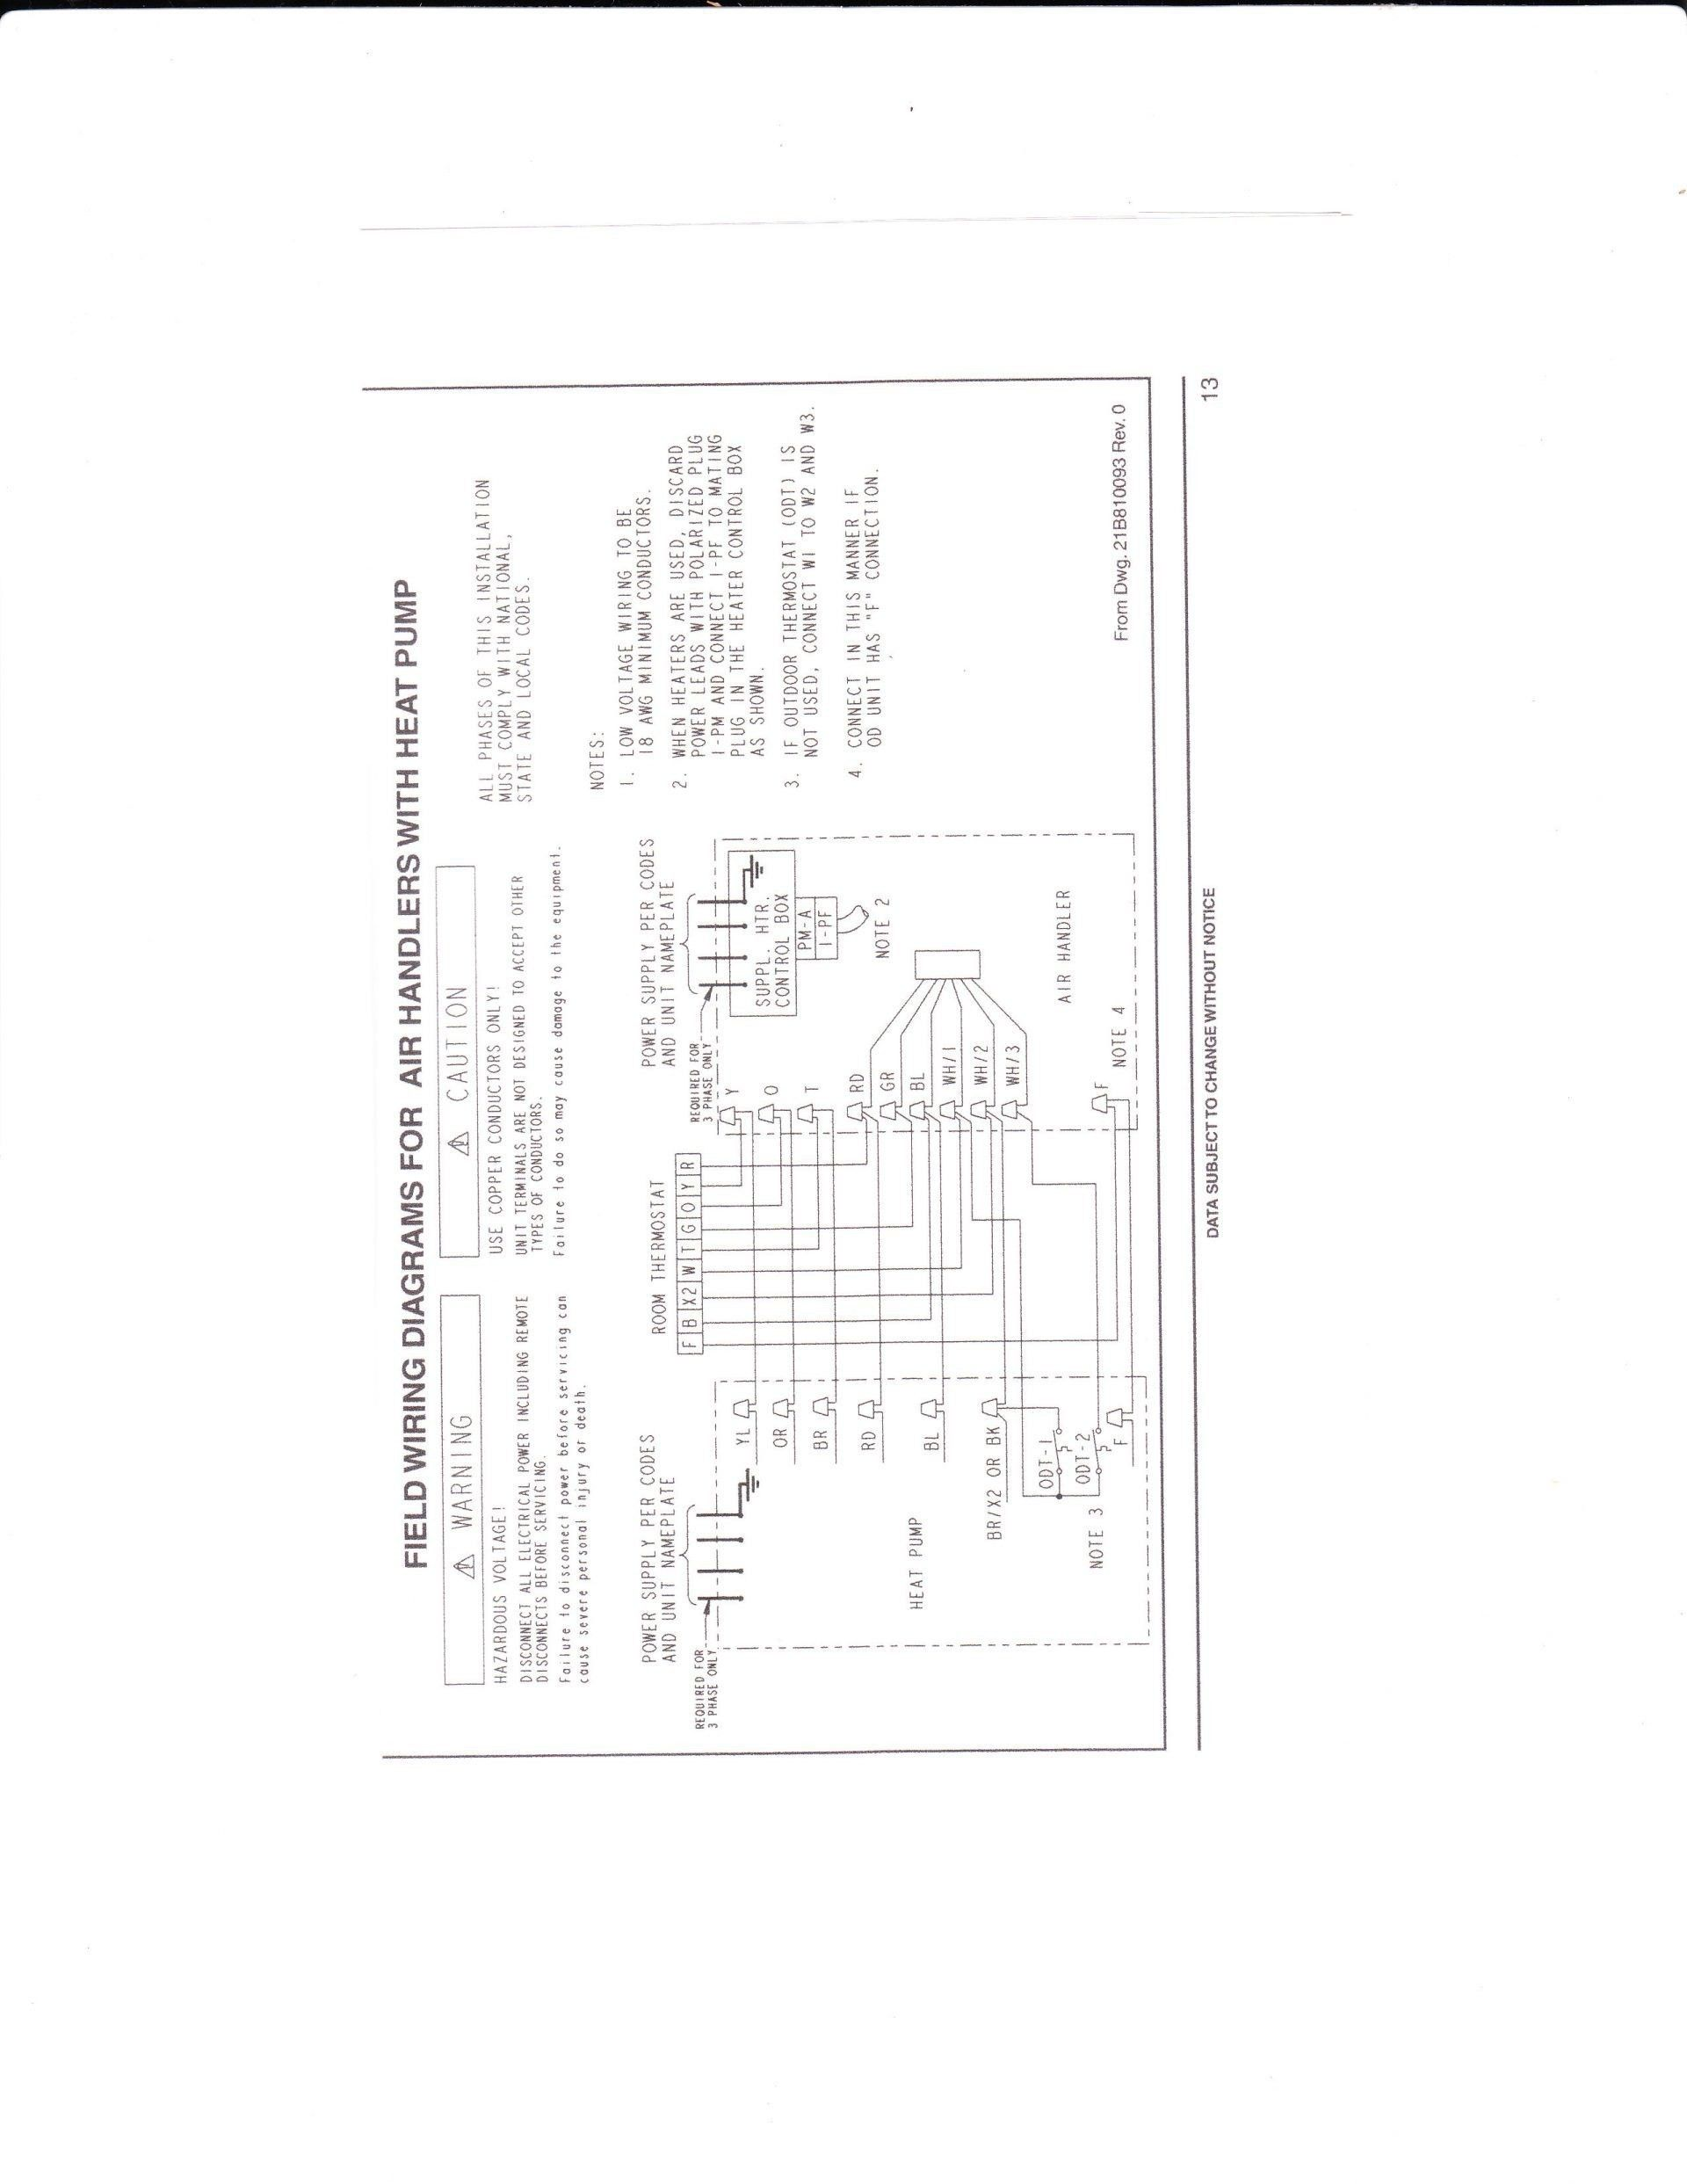 Unique Wiring Diagram For Square D Lighting Contactor